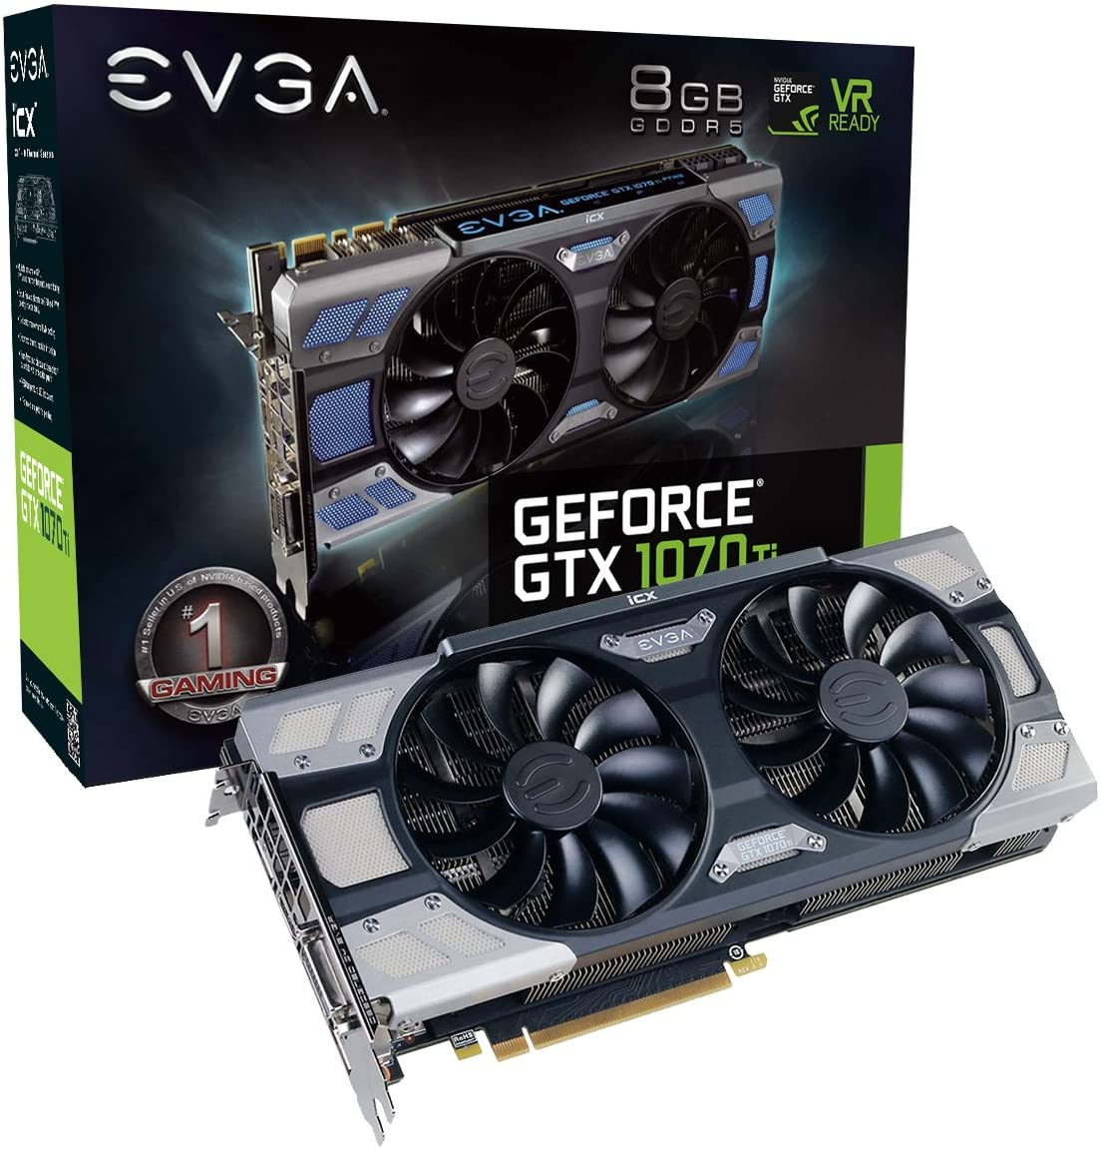 EVGA GeForce GTX 1070 Ti Graphics Card– Best GPU For PUBG